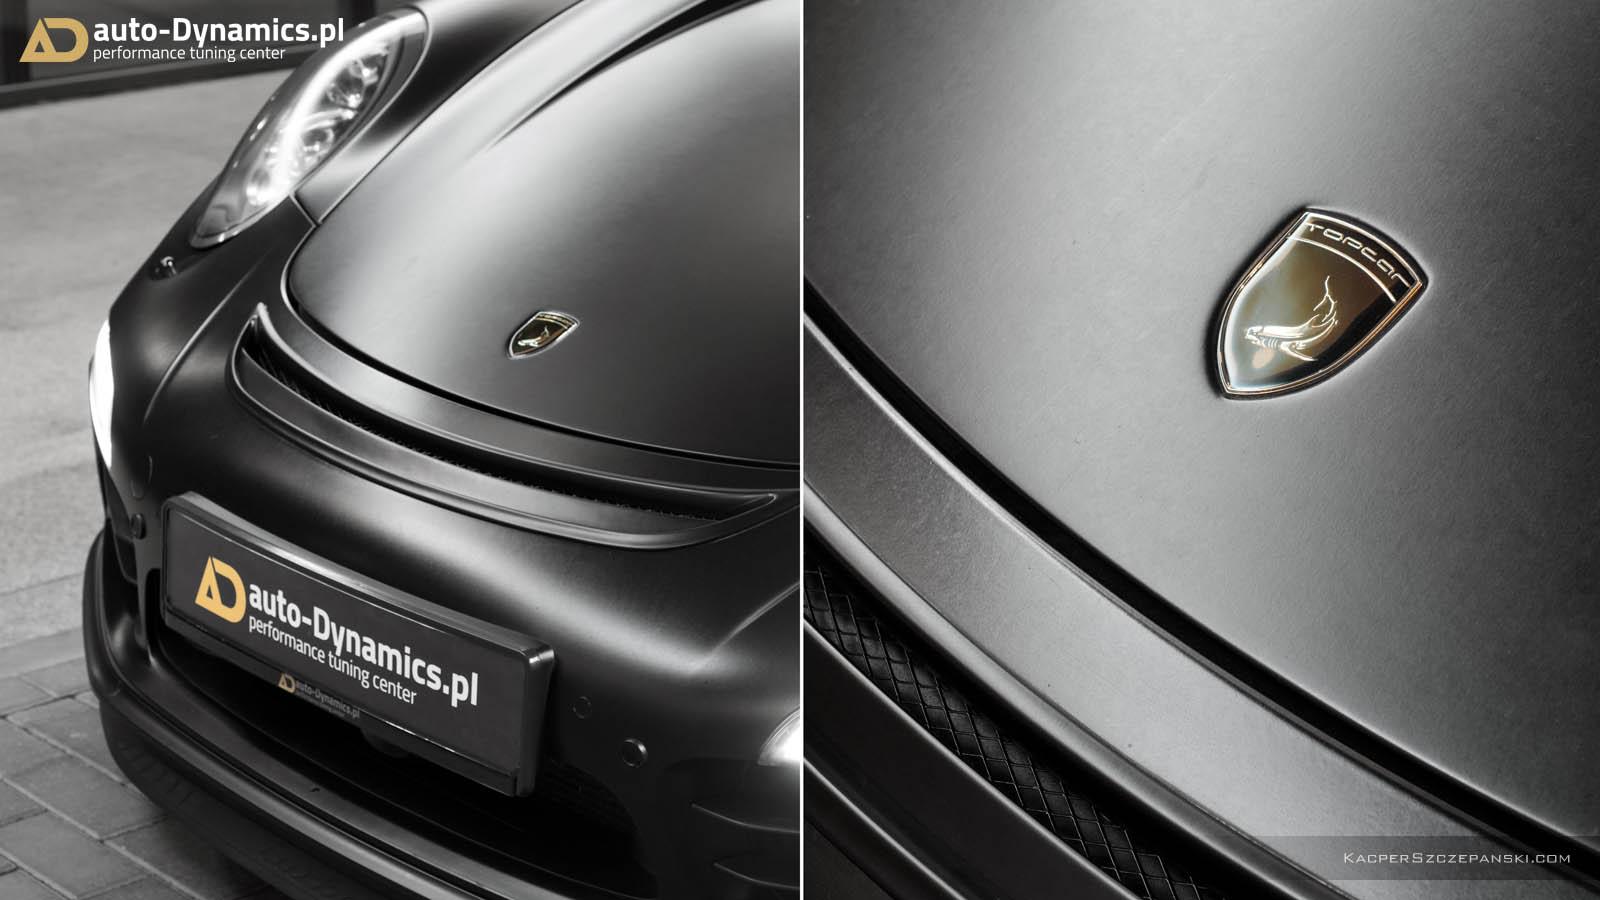 Porsche 911 Turbo S by Auto-Dynamics (4)